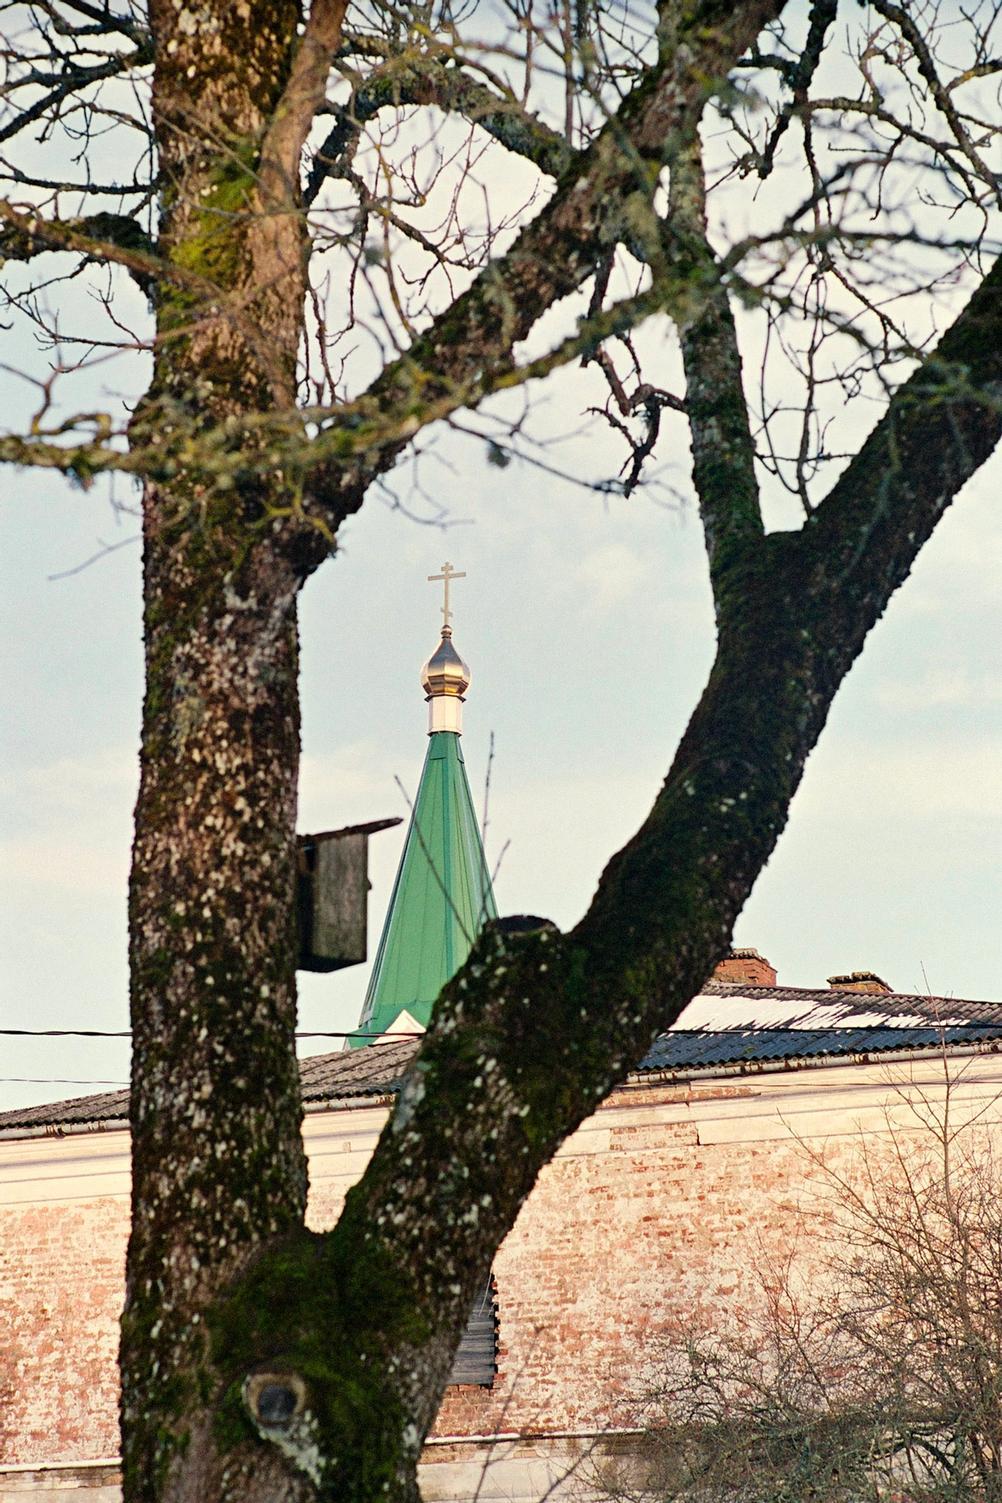 Photo of a top of a church through a tree.